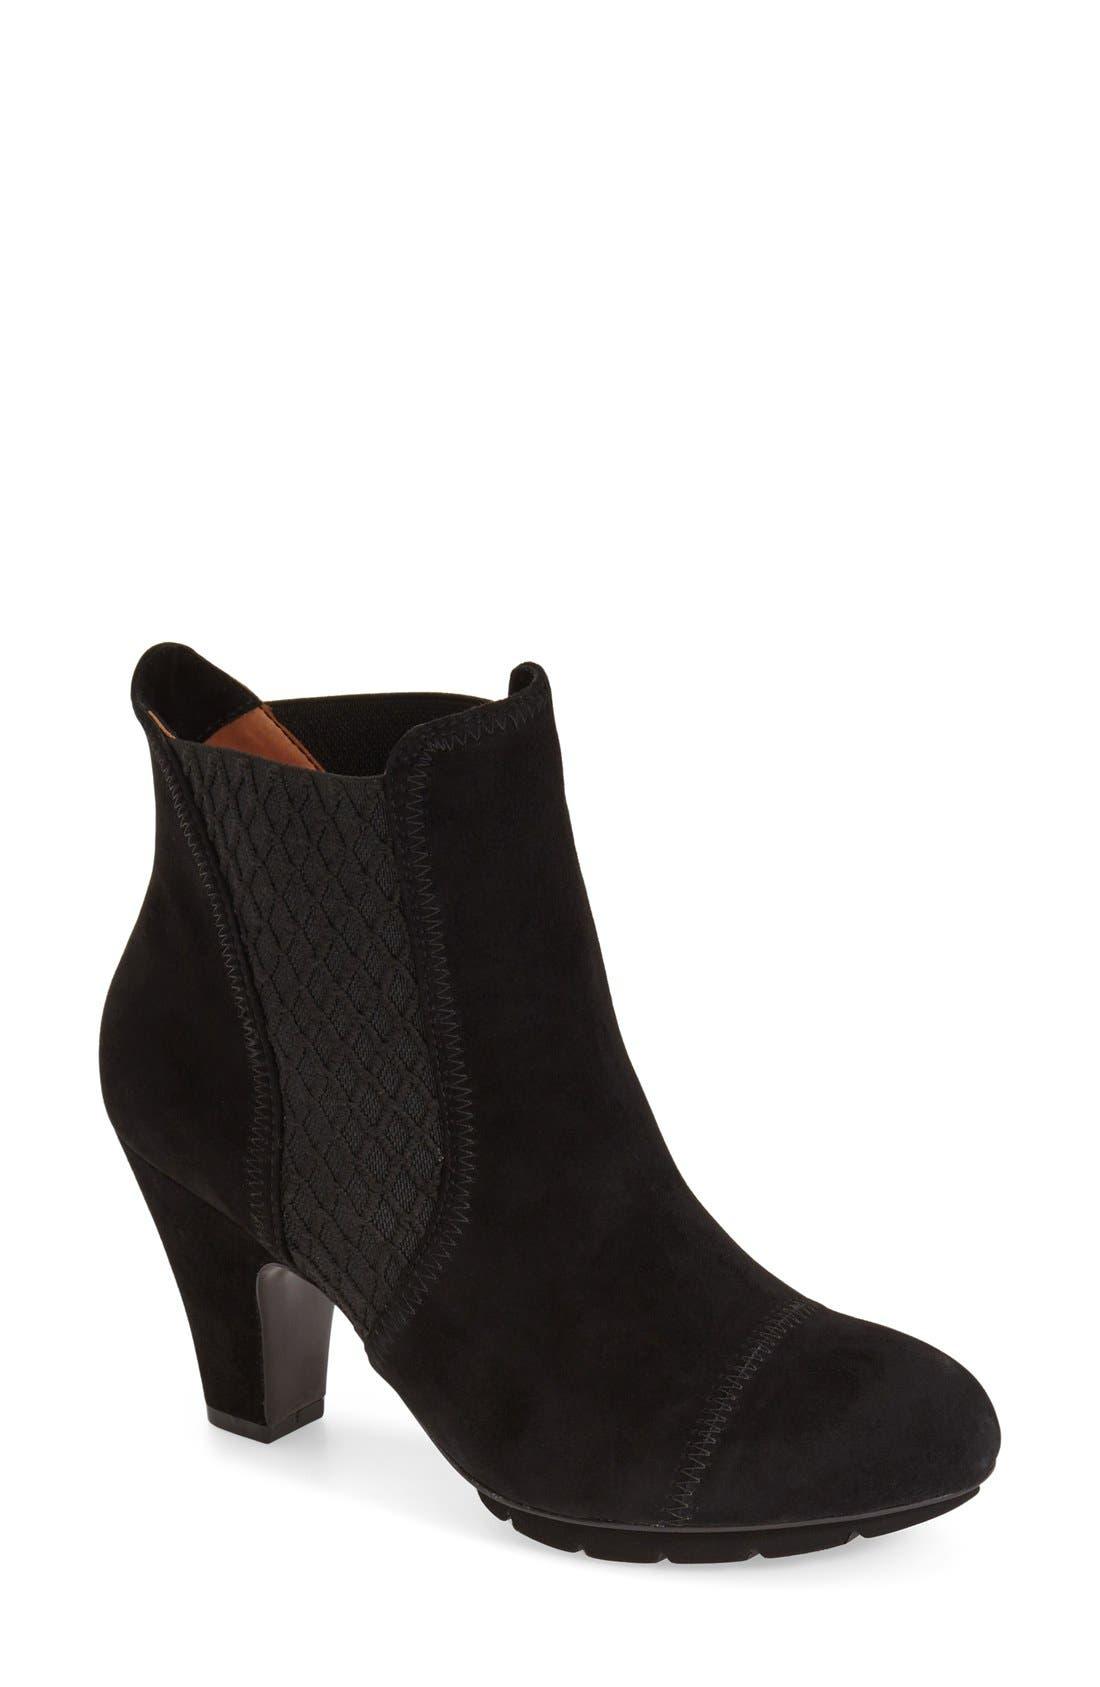 Main Image - L'Amourdes Pieds'Faaris' Chelsea Boot (Women)